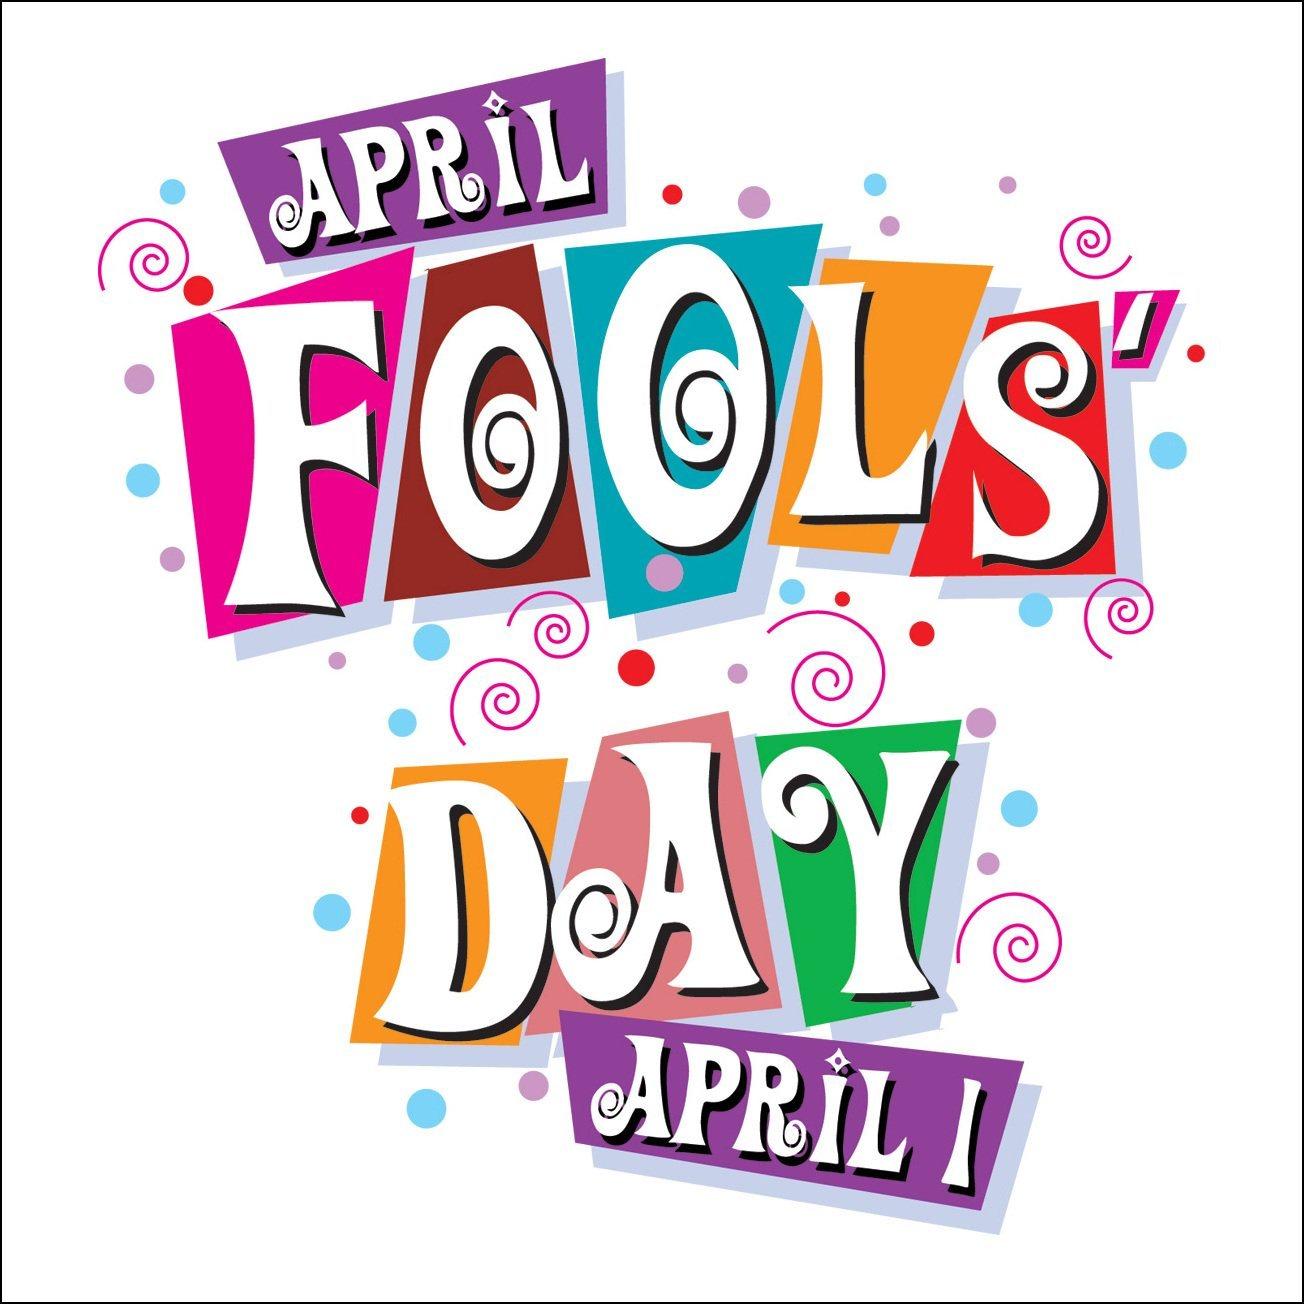 April Fool Day 2019